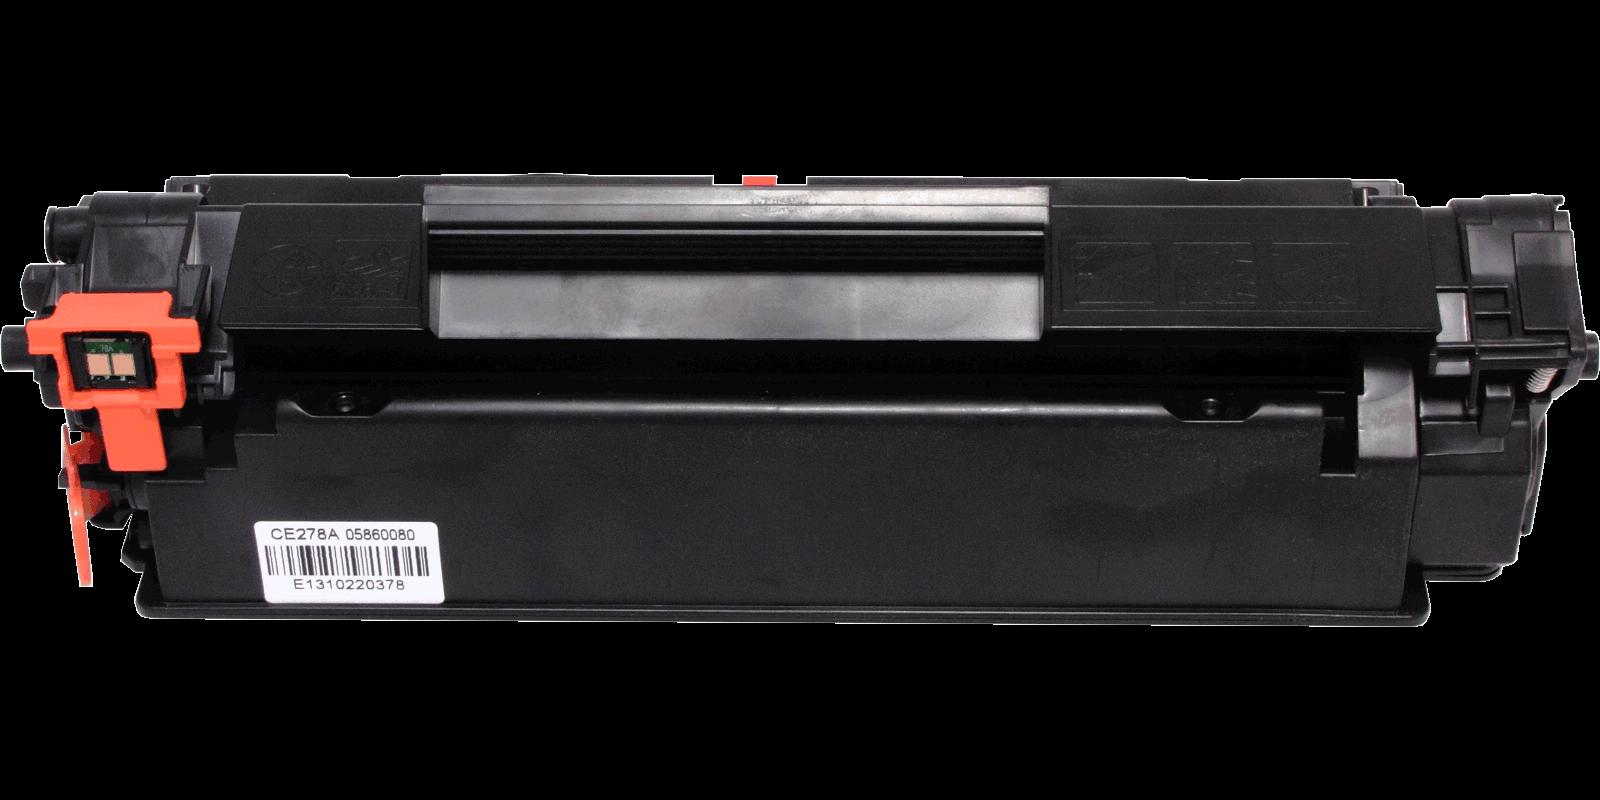 ULTRA №78A CE278A/(Cartridge 728), черный, для HP/Canon, до 2000 стр.